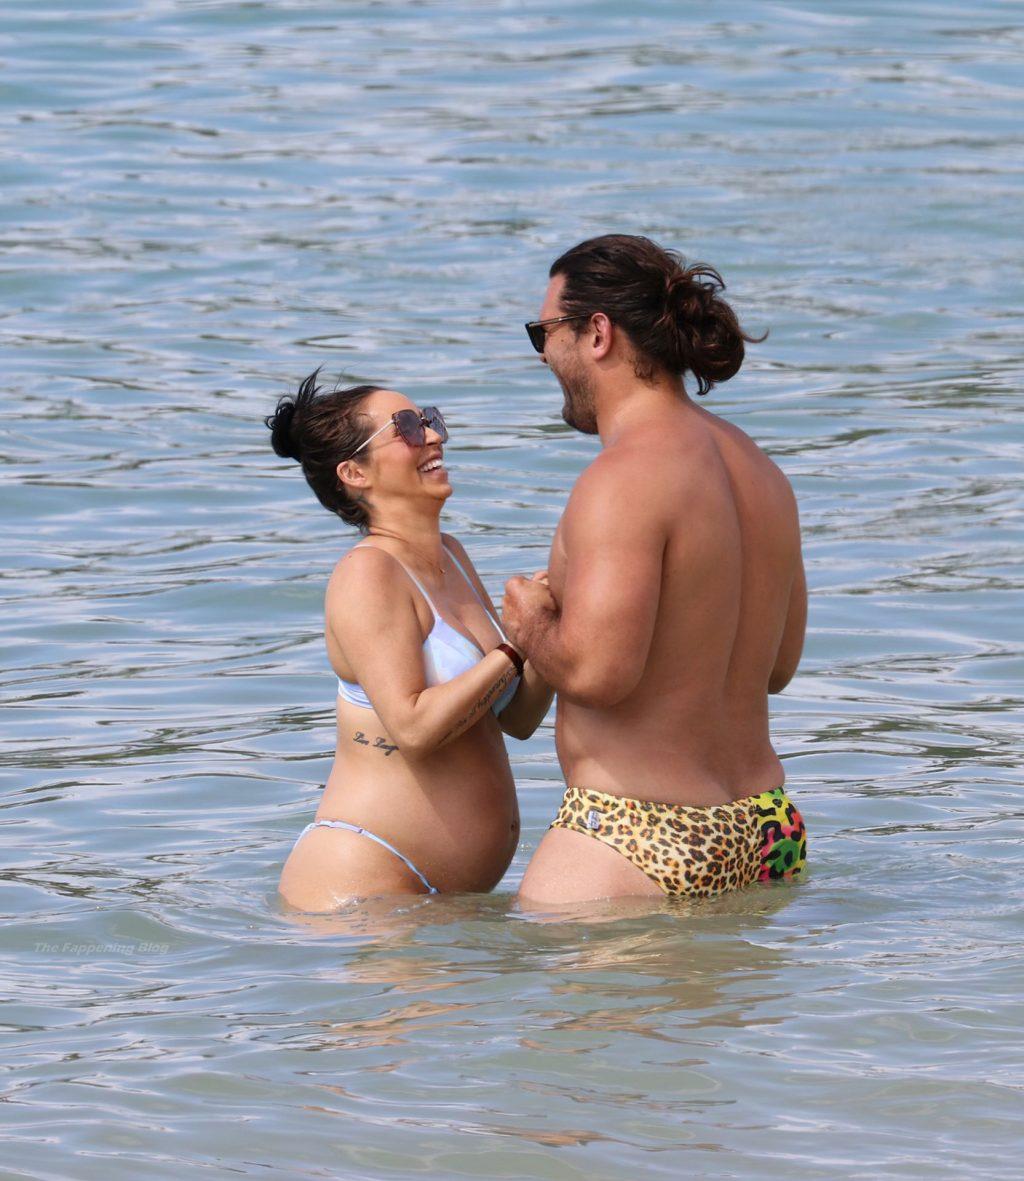 Scheana Shay & Brock Davies Enjoy a Day at The Beach in Hawaii (30 Photos)